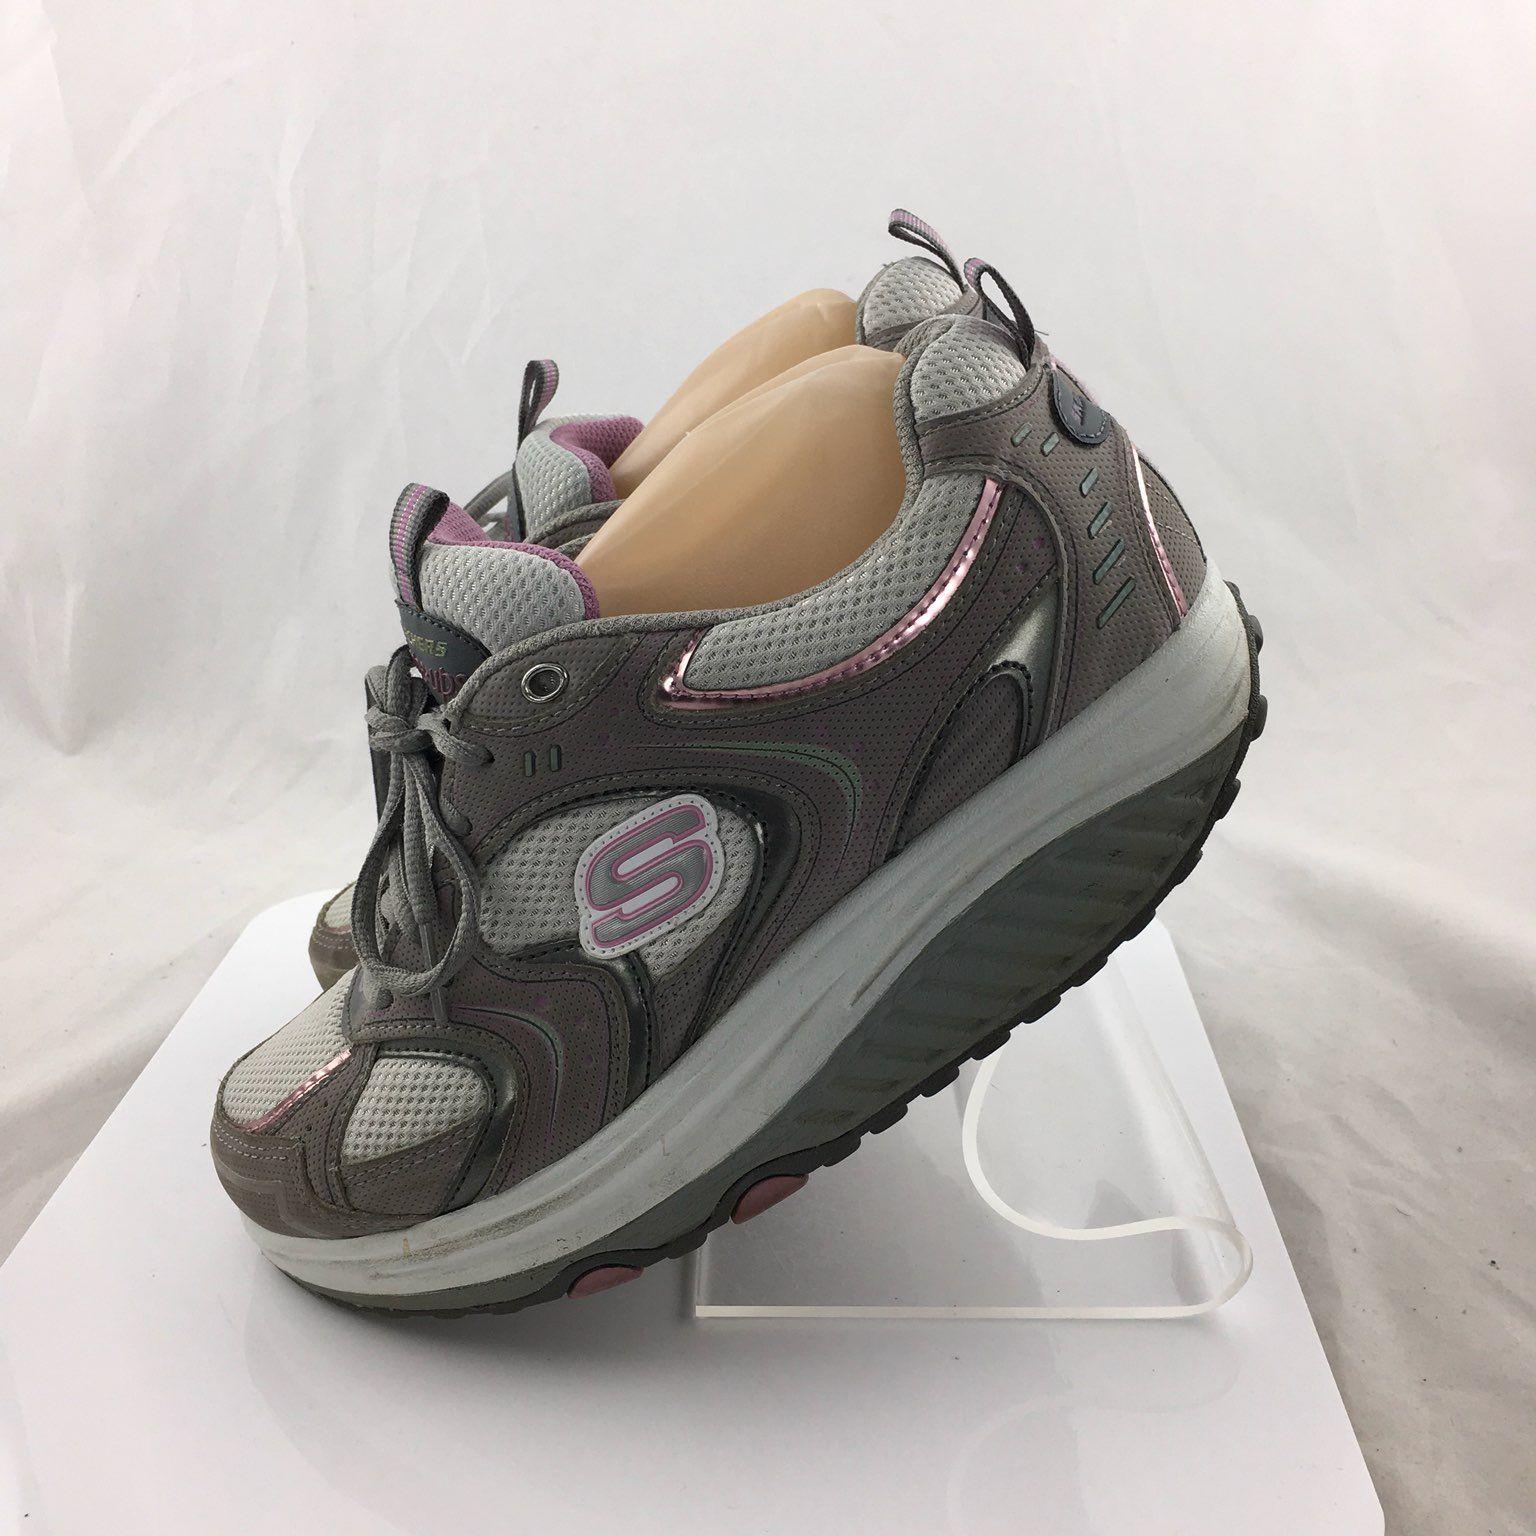 566f30e17f2ee Sketchers Shape Ups 9.5 M Sneakers - Mercari  The Selling App ...